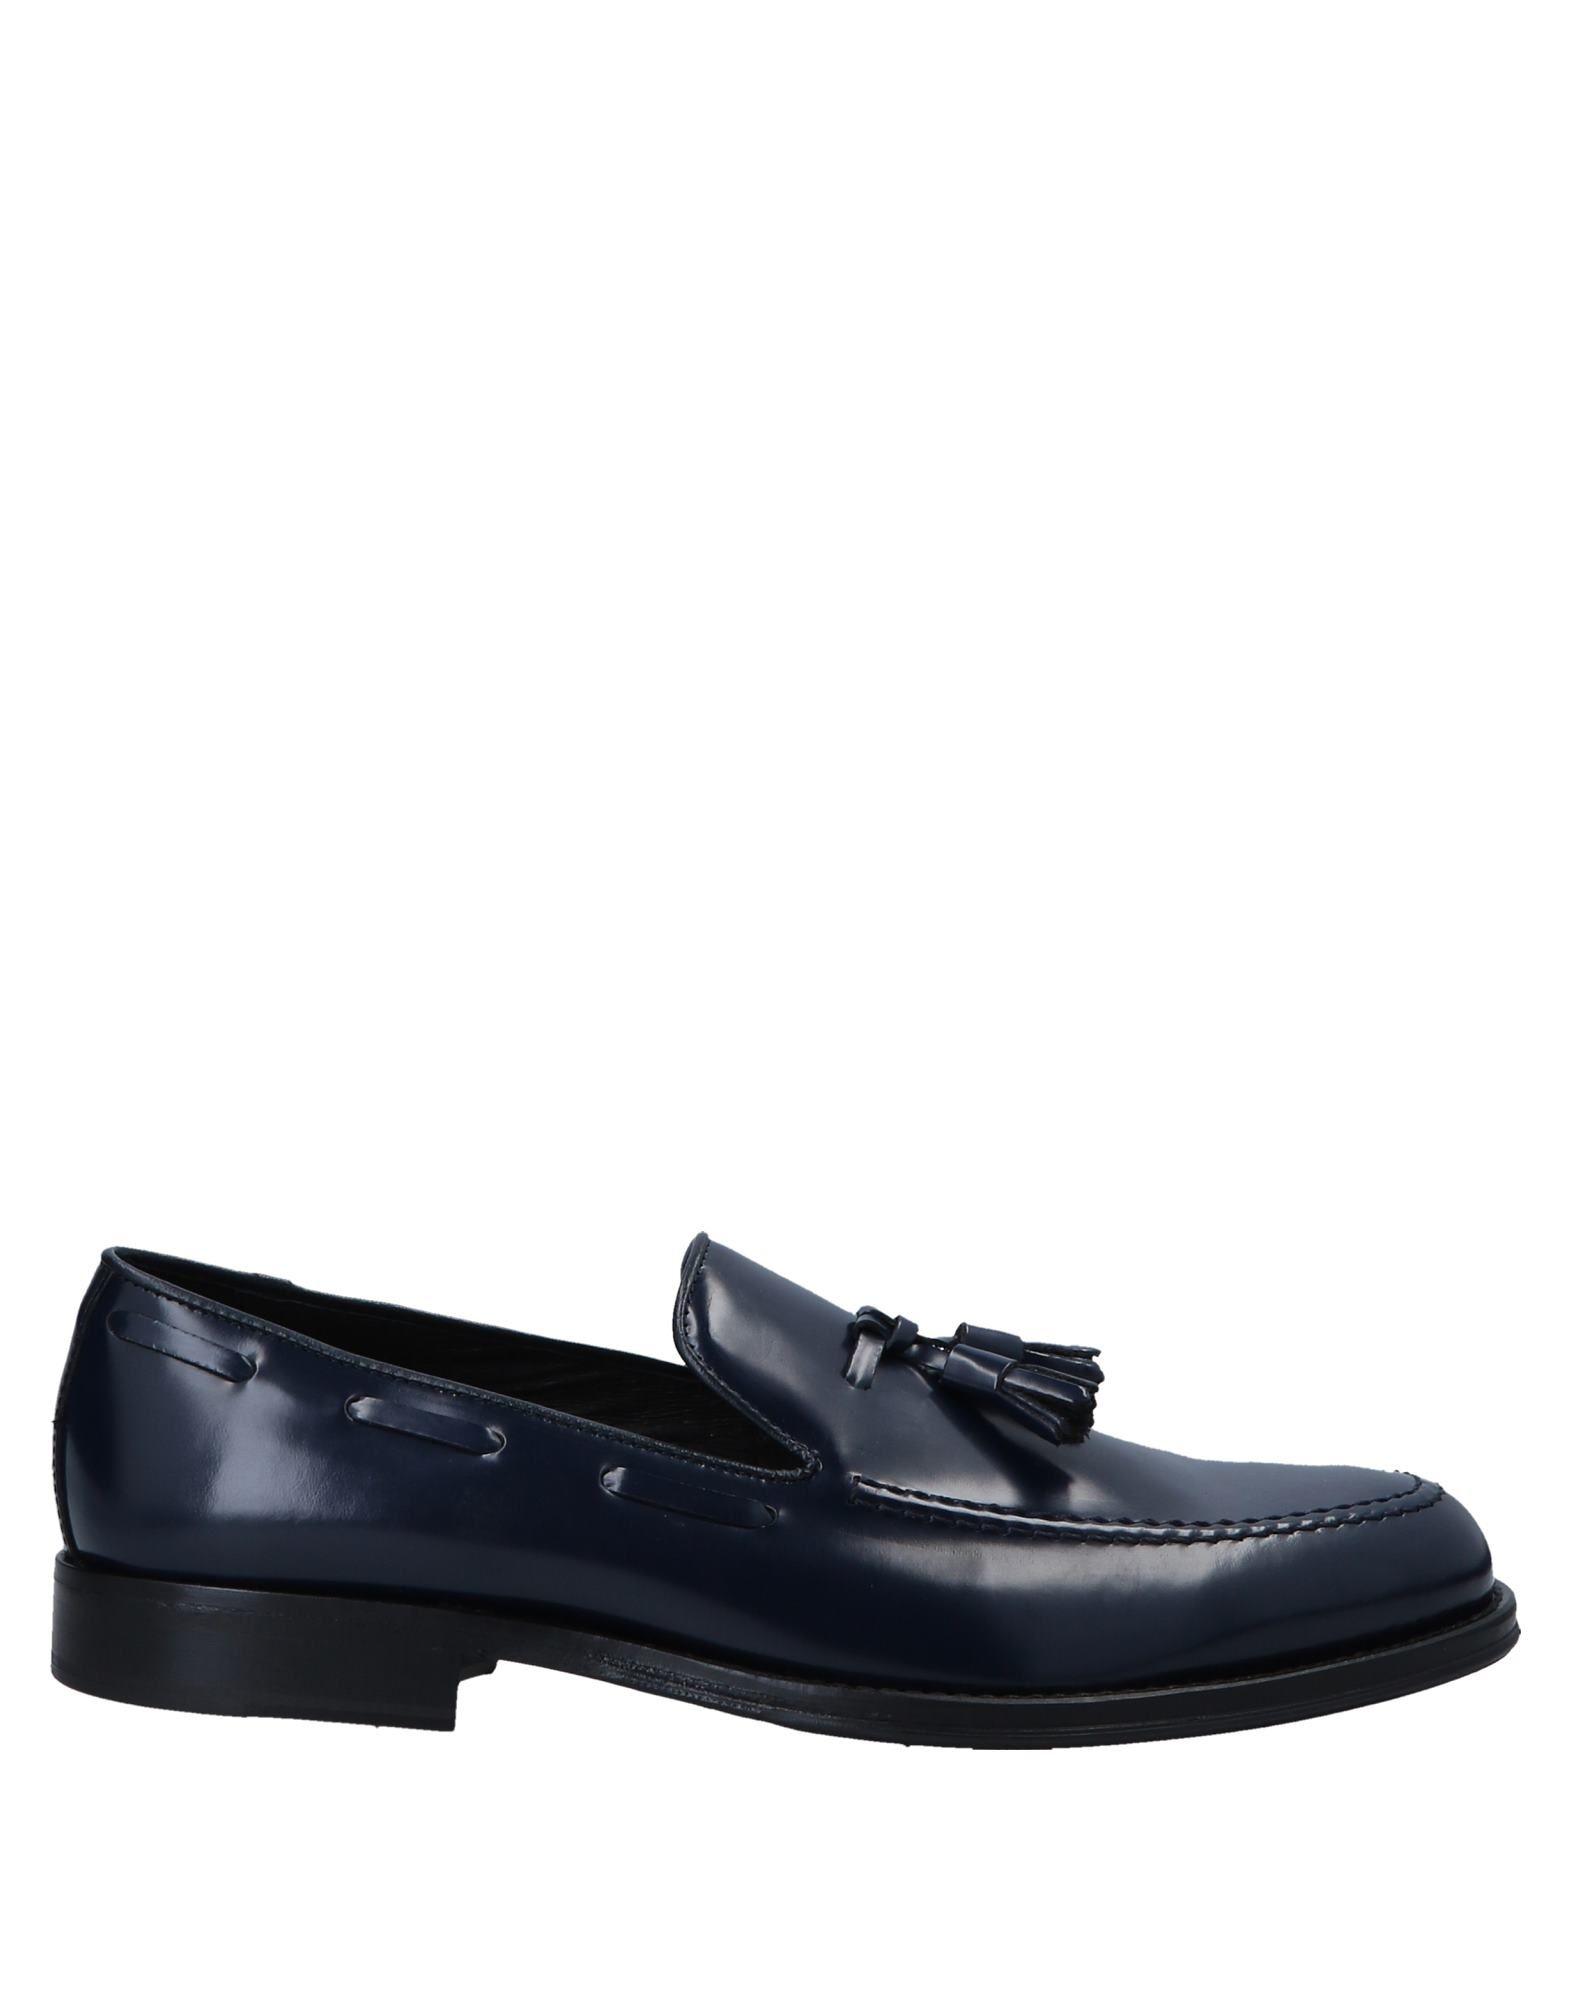 Gianfranco Lattanzi Mokassins Herren  11547082UQ Gute Qualität beliebte Schuhe